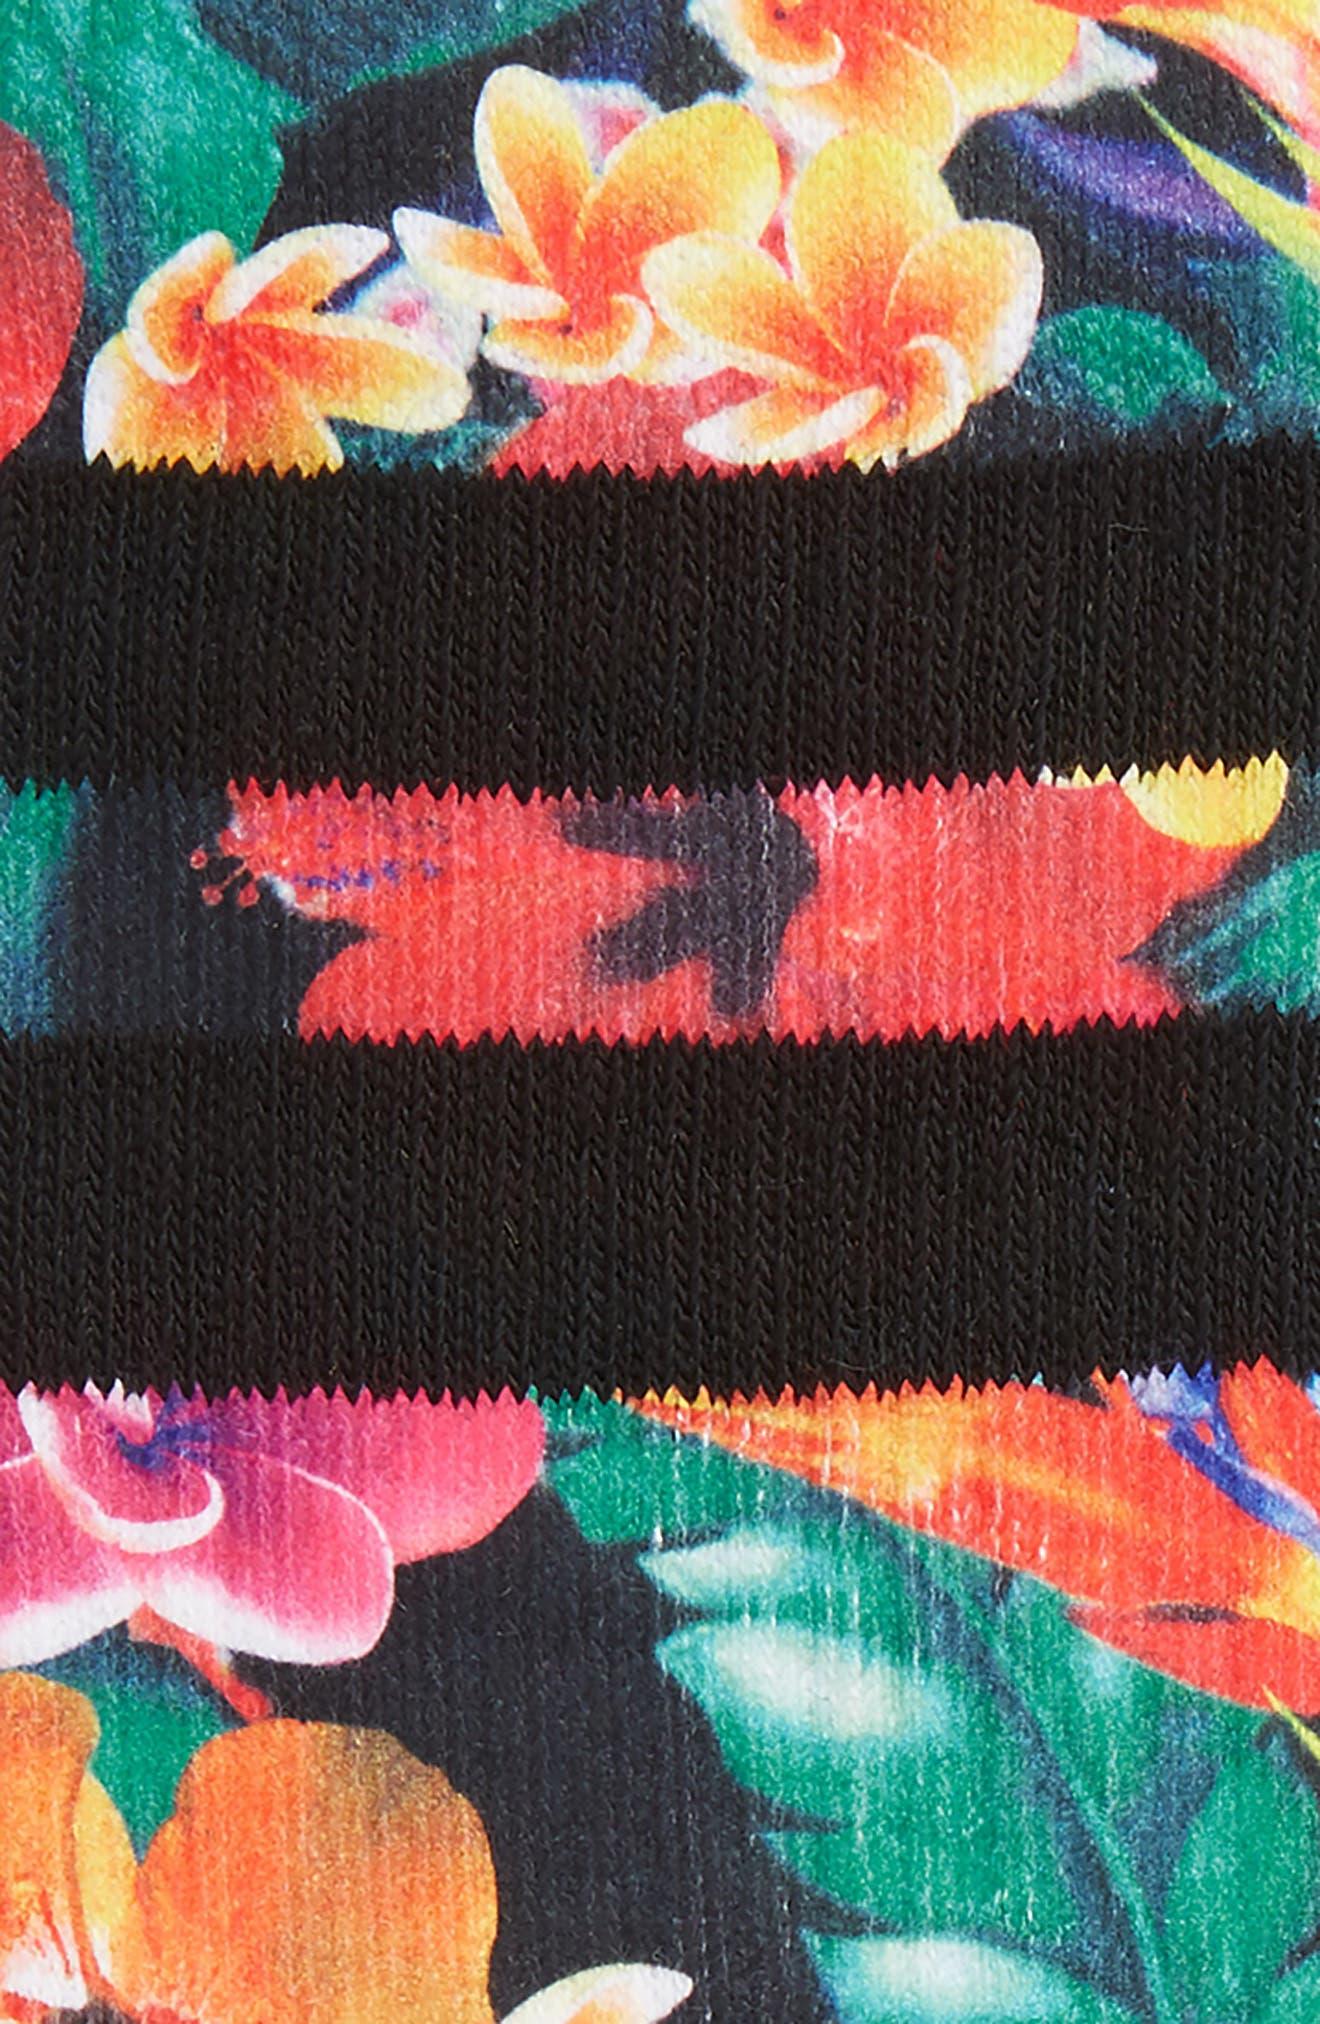 Pau Floral Socks,                             Alternate thumbnail 2, color,                             GREEN MULTI